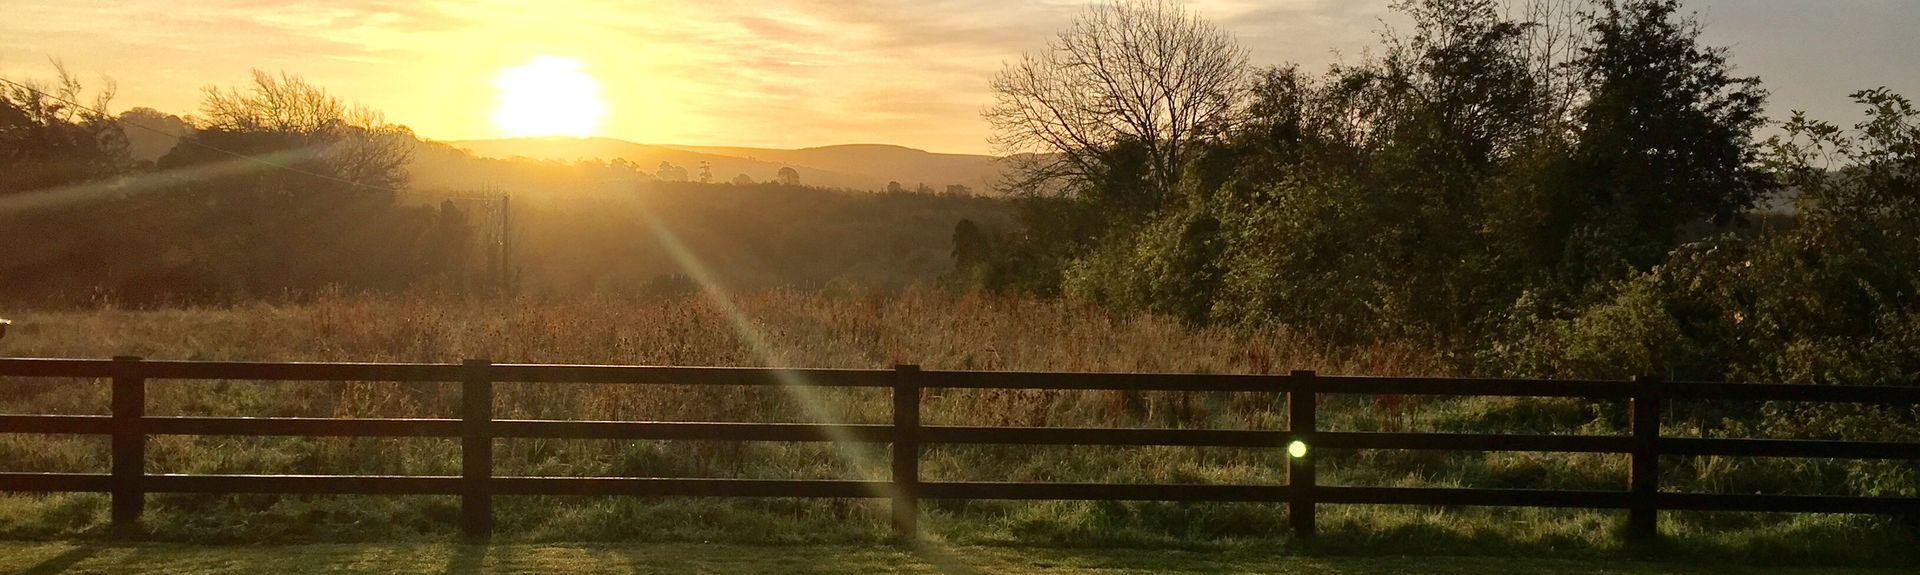 Ballard Organic Farm, Kilbeggan, Westmeath (distrito), Irlanda